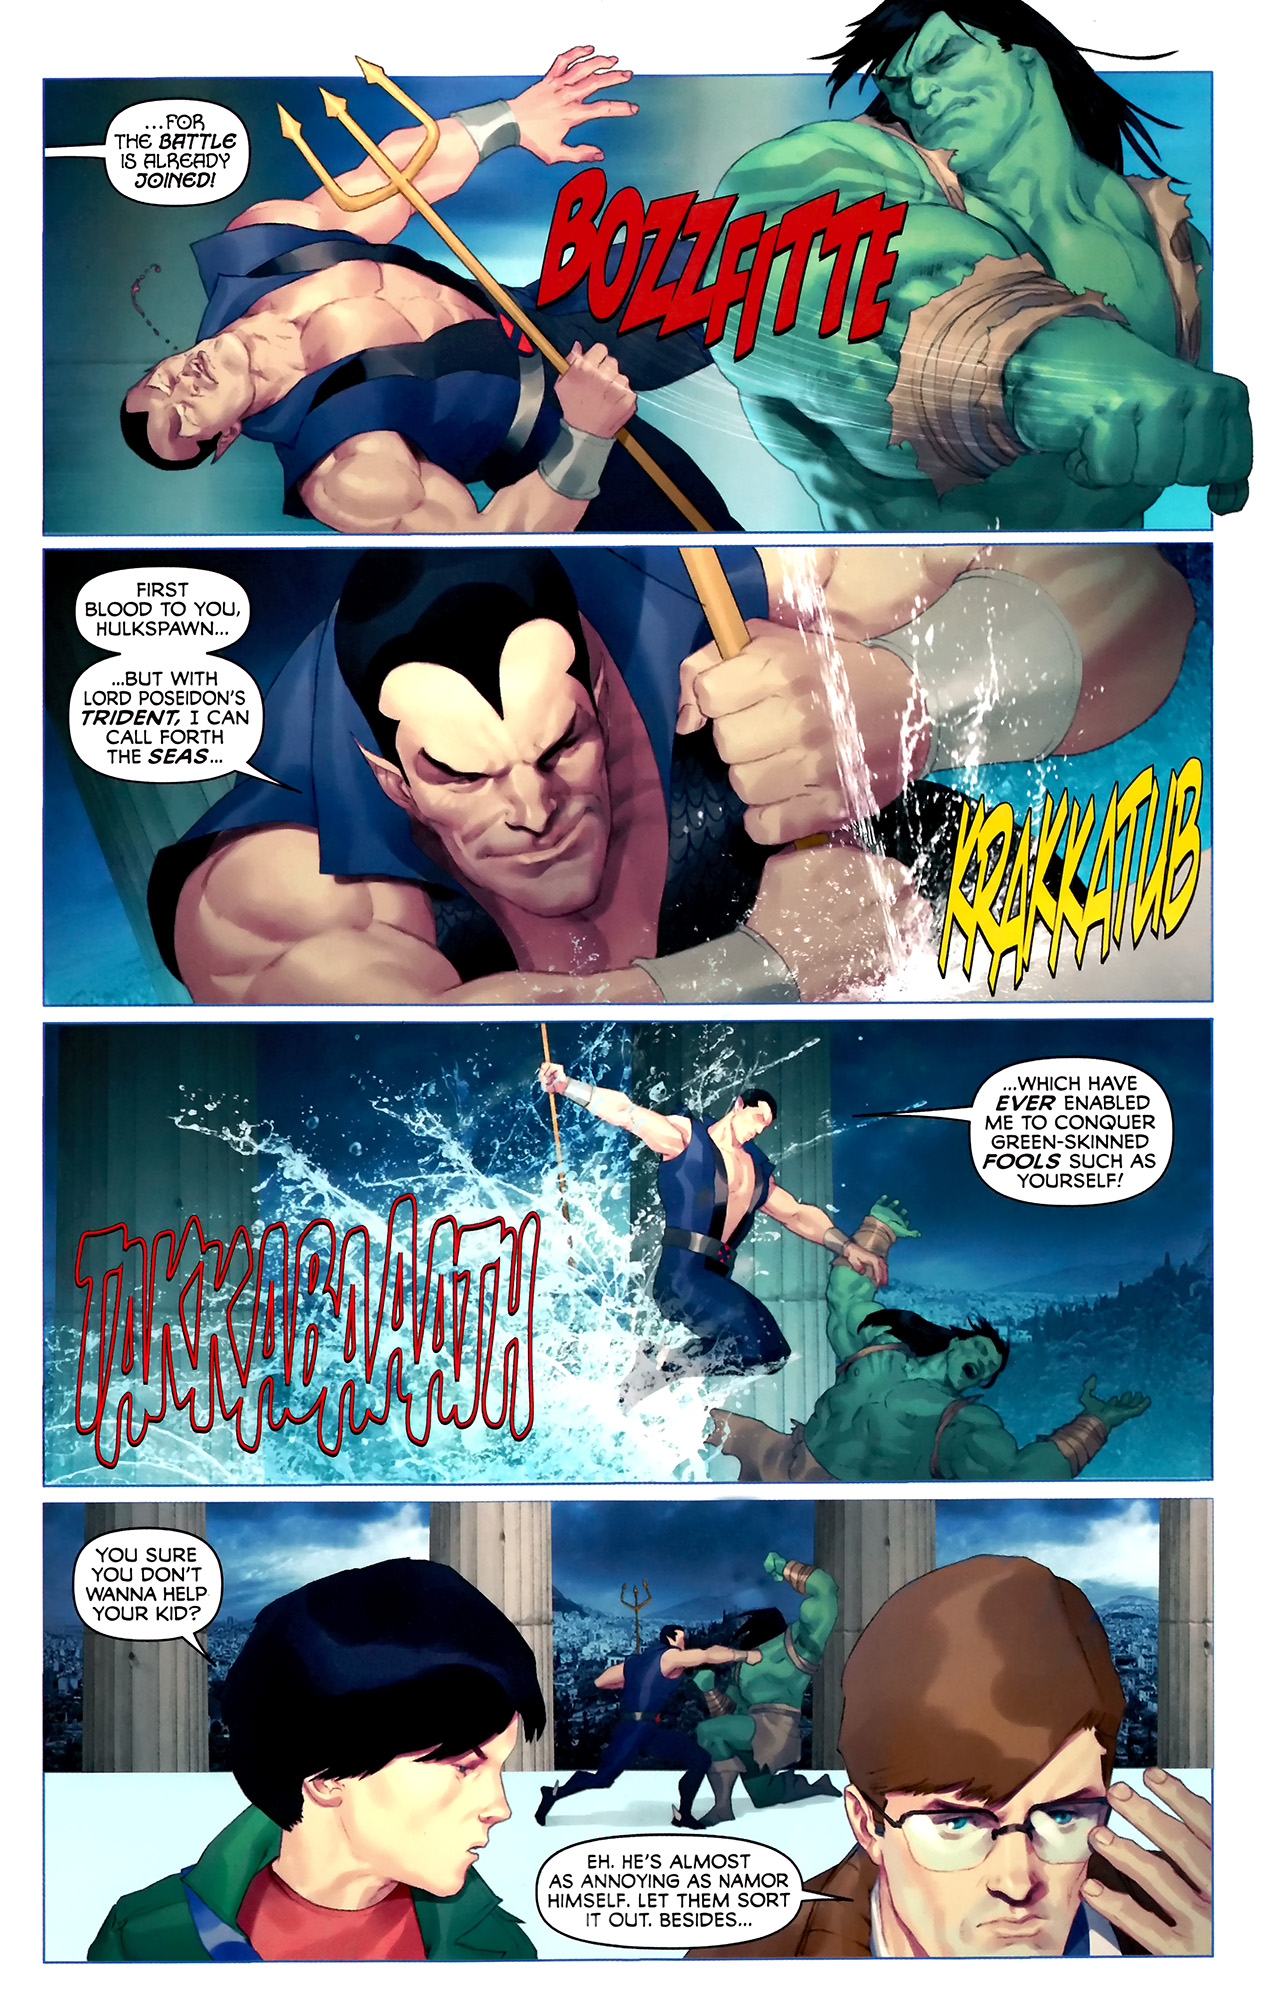 Read online Hercules: Fall of an Avenger comic -  Issue #2 - 11